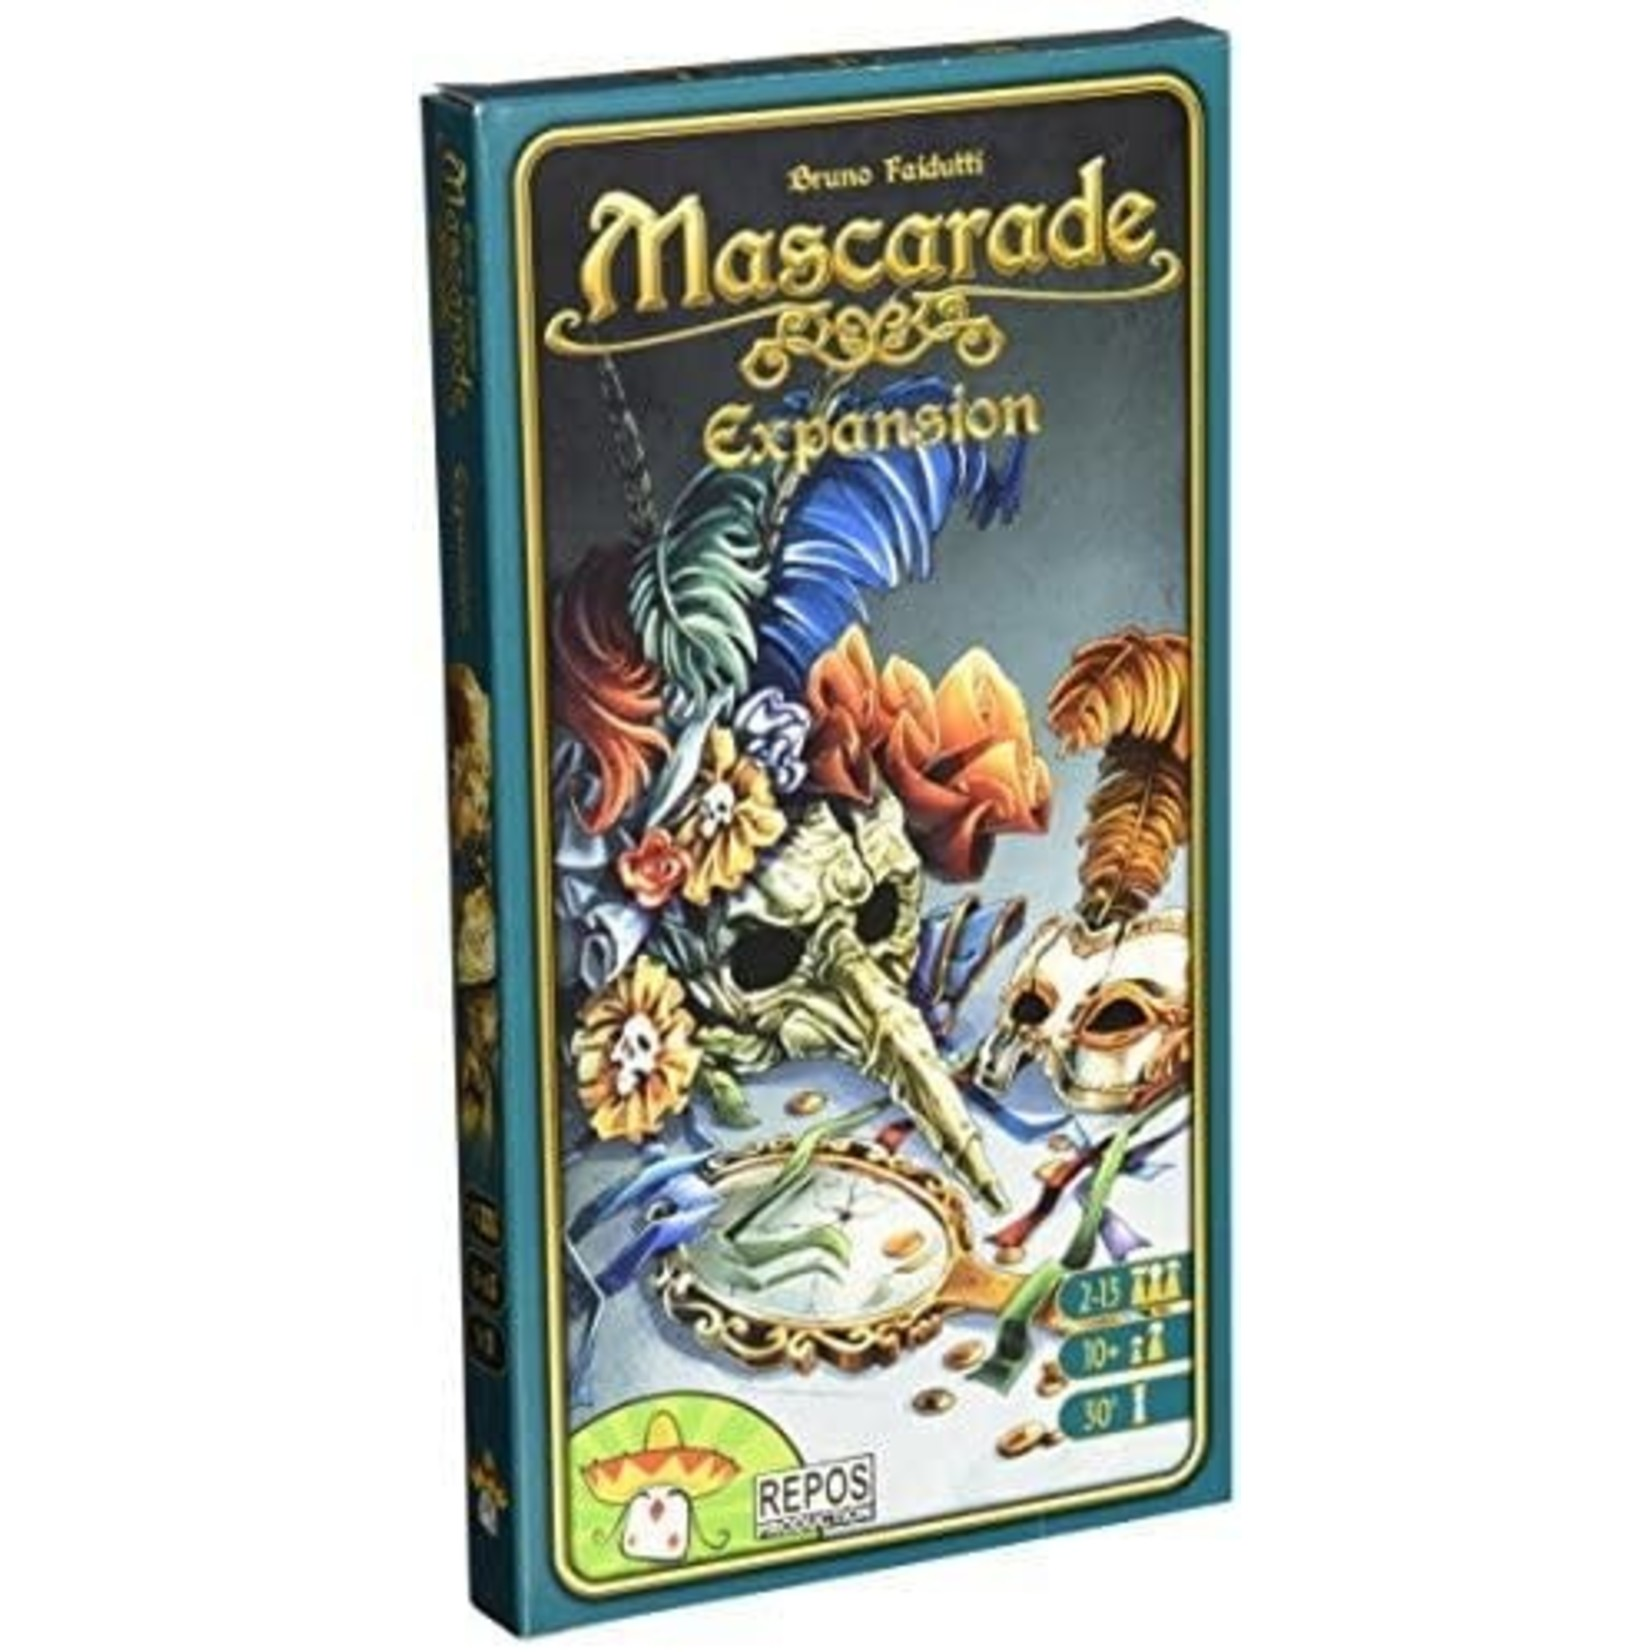 Mascarade Expansion Board Game